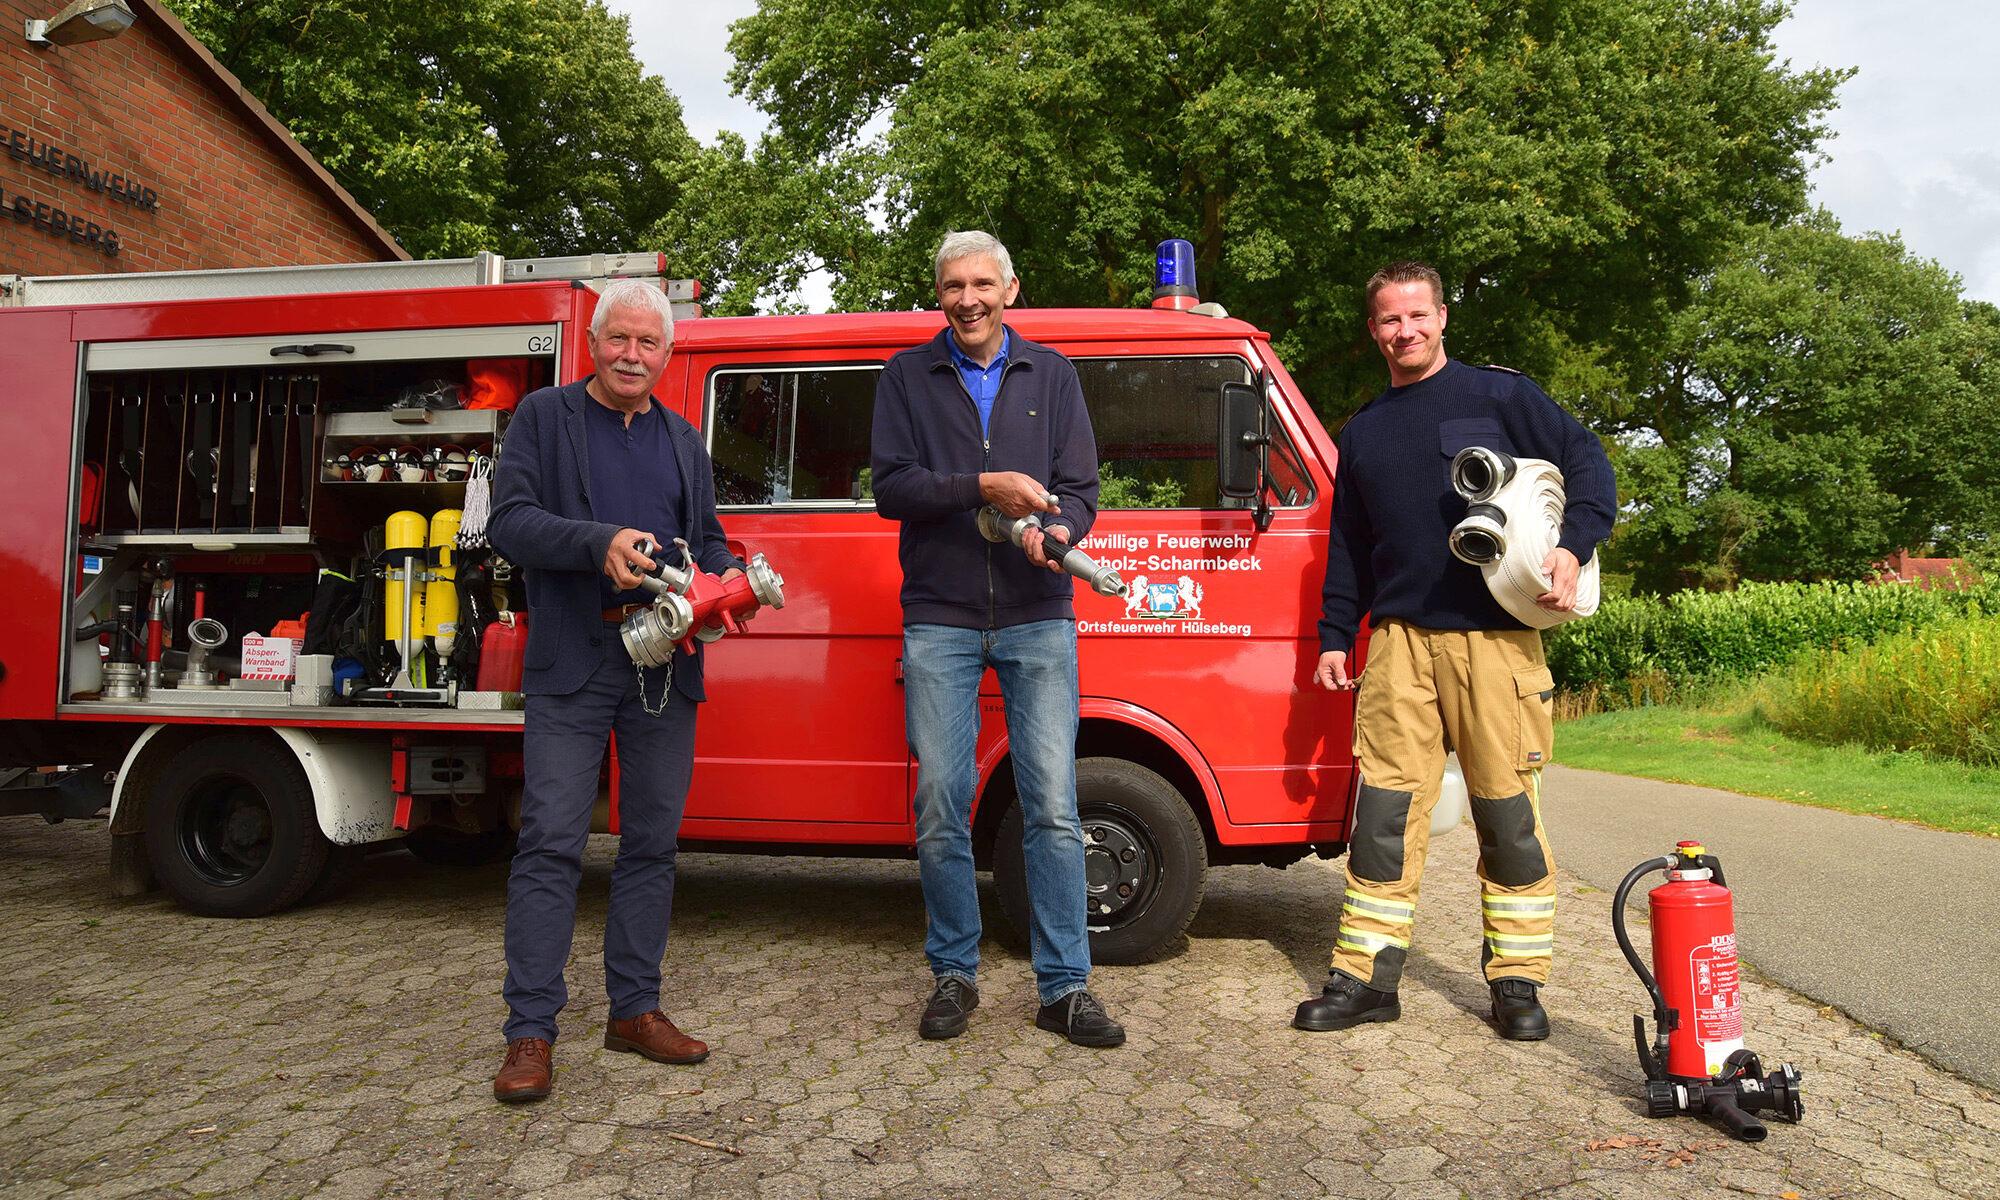 Torsten Rohde zu Besuch in Hülseberg